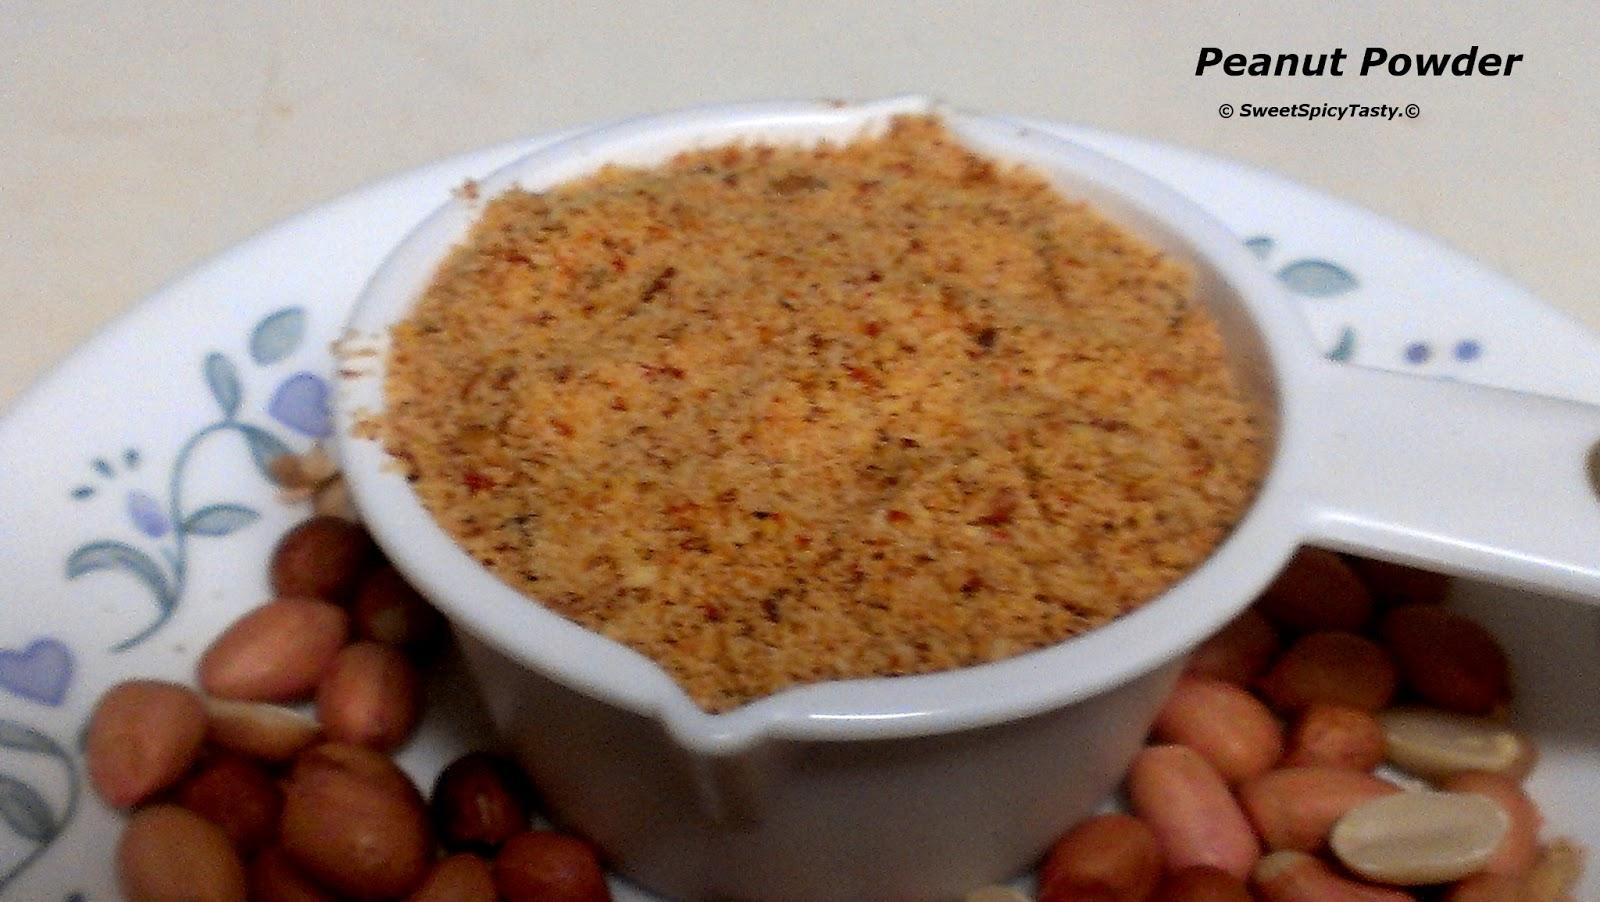 peanut powder, verkadalai podi, shengdhana masala, groundnut masala powder, kadlekaai pudi